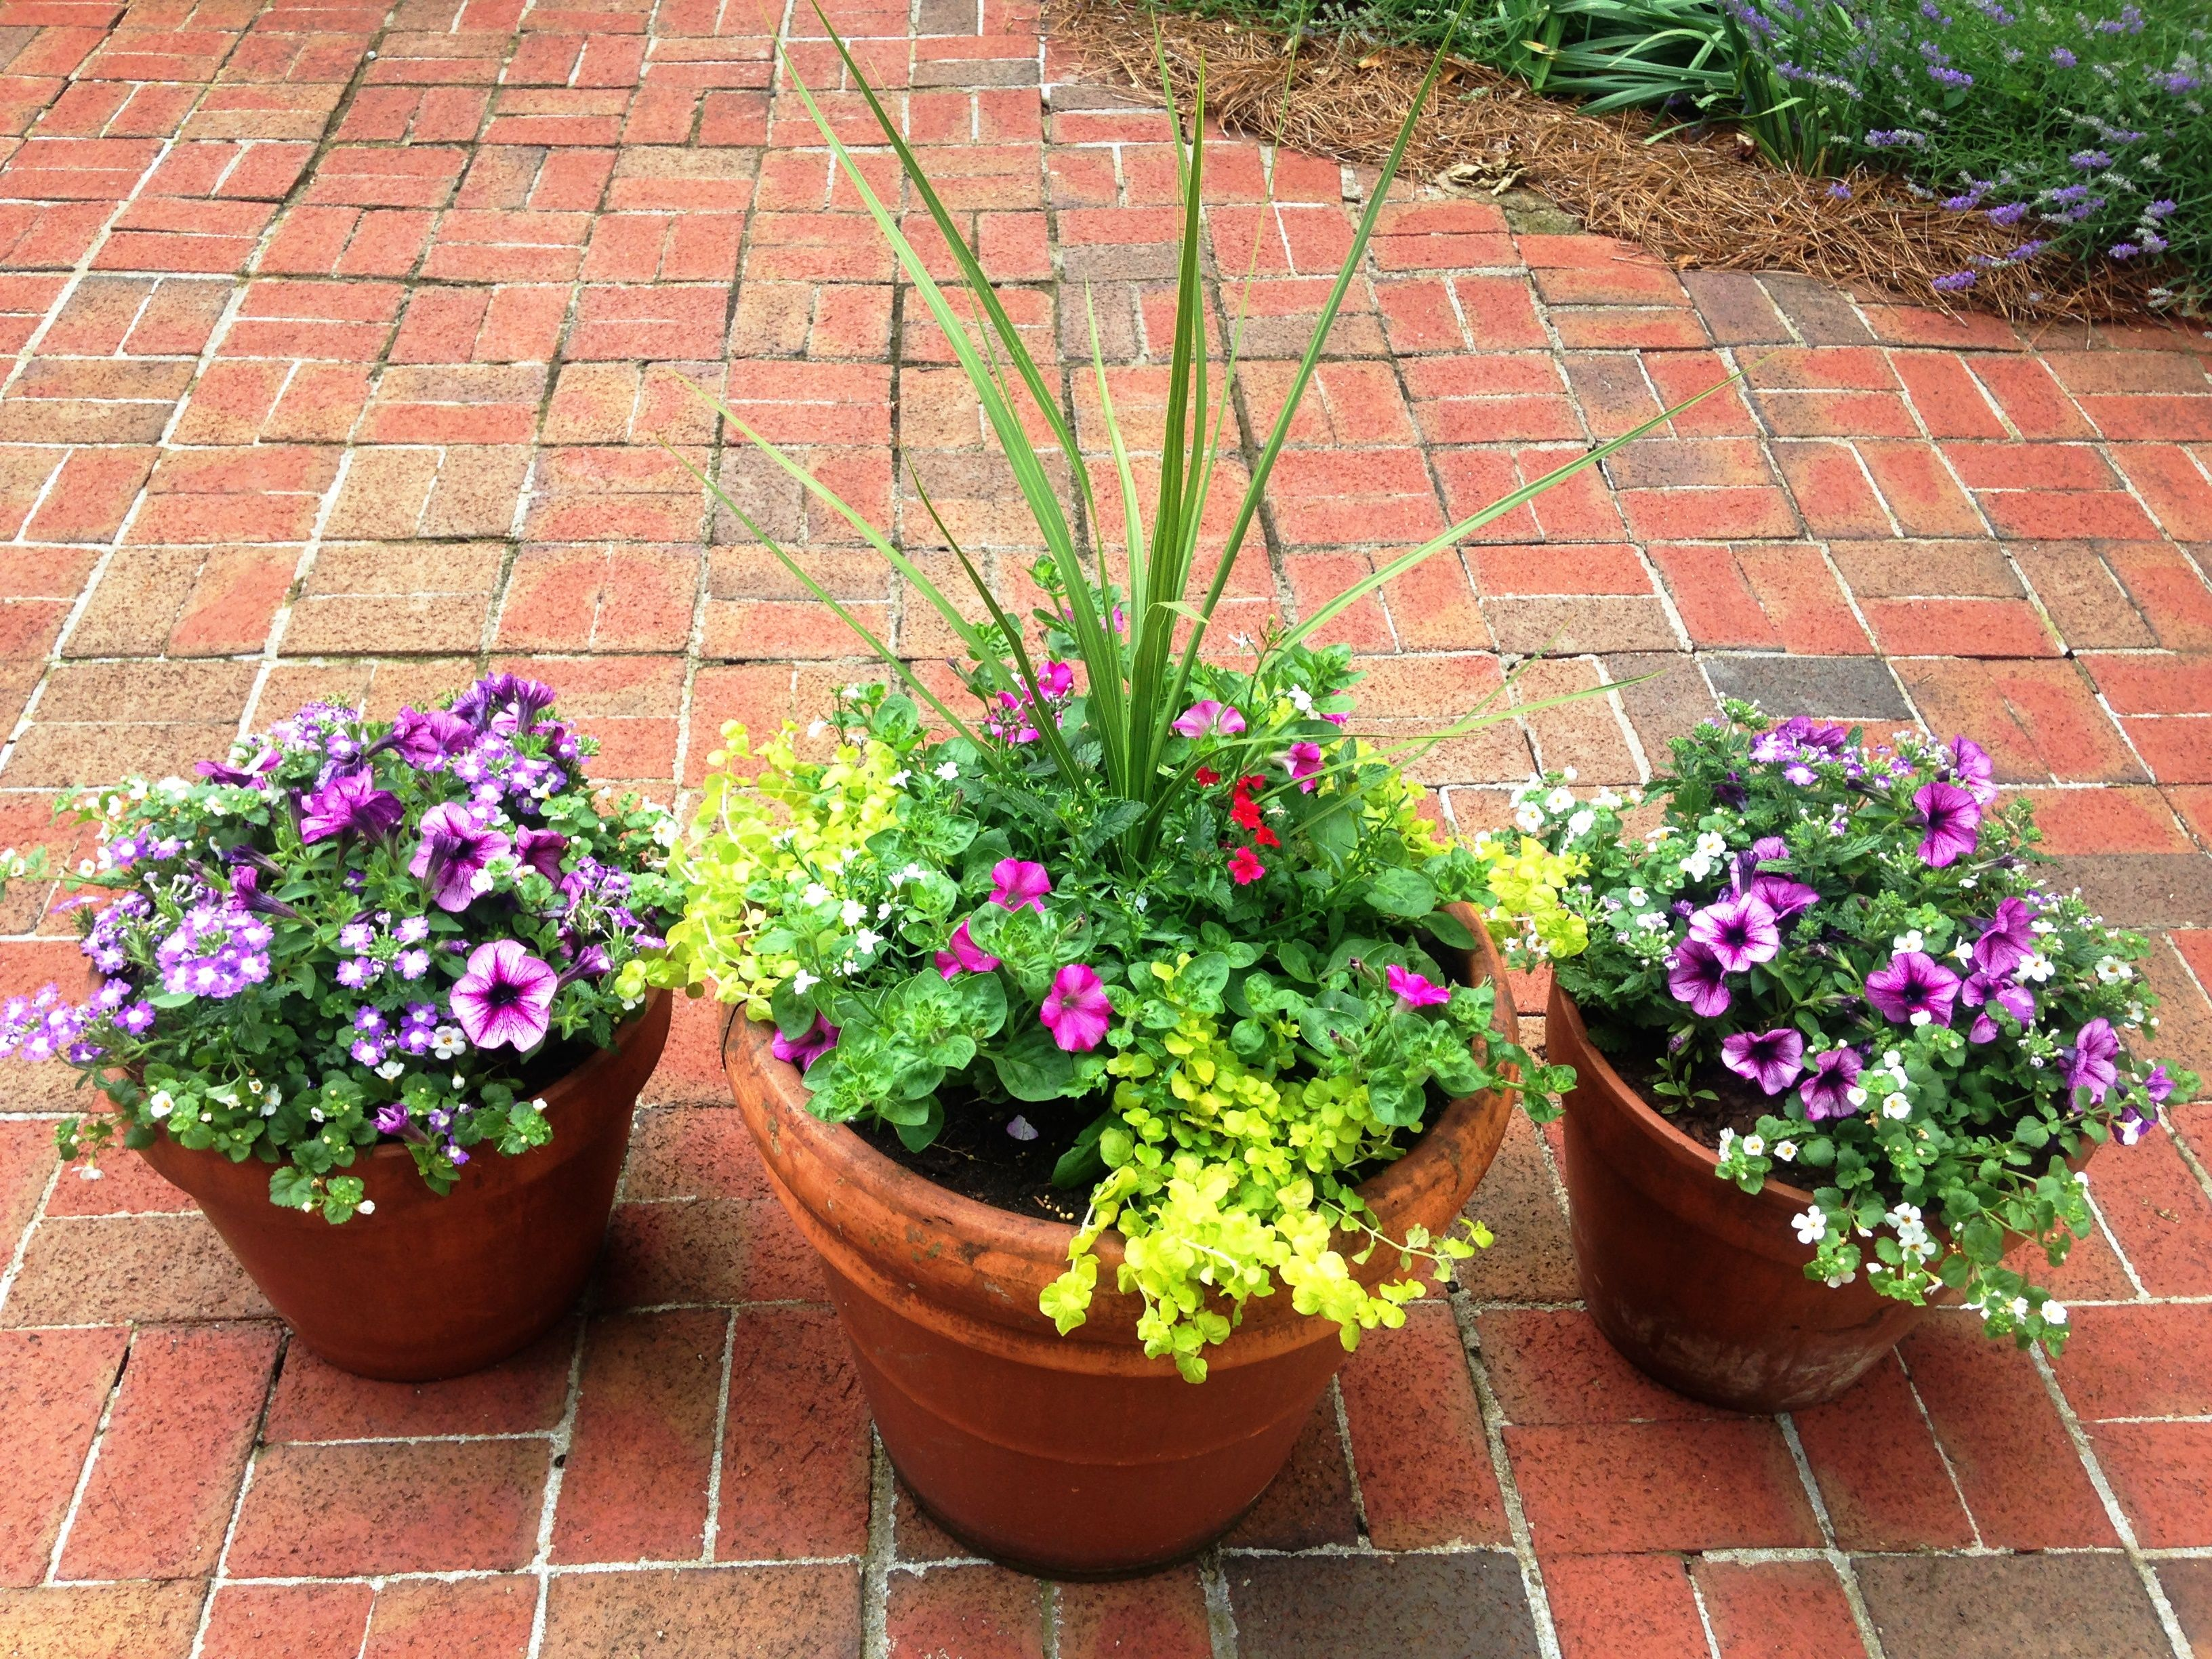 Porch Pots Center Pot Has A Thriller Dracena Spike Filler Pastel Mix Of Petunias Verbena And Lobelia And A Spiller Cre Creeping Jenny Dracena Plants